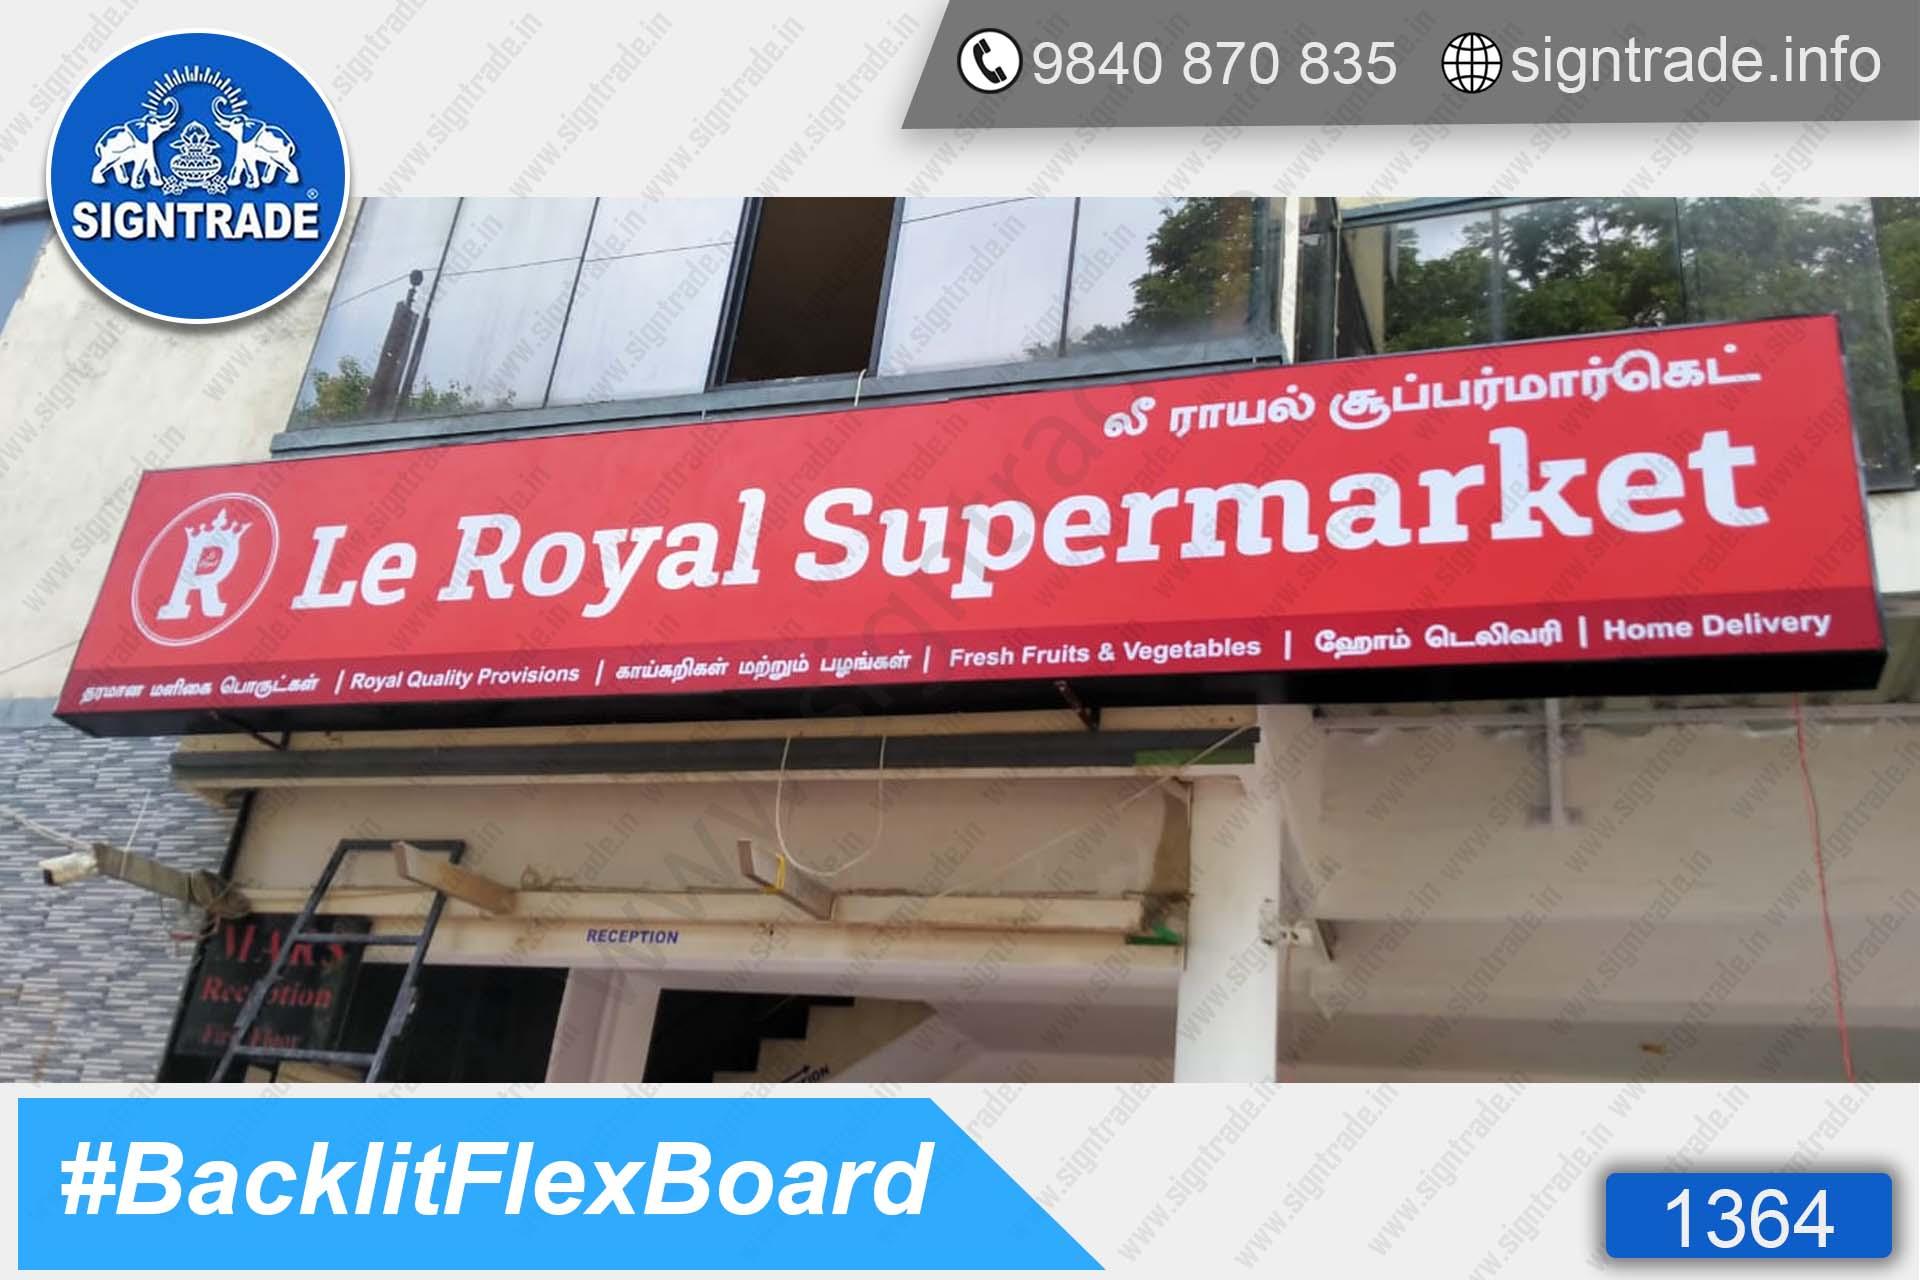 Le Royal Supermarket - Pallavaram - Chennai - SIGNTRADE - Backlit Flex Board Manufacturers in Chennai